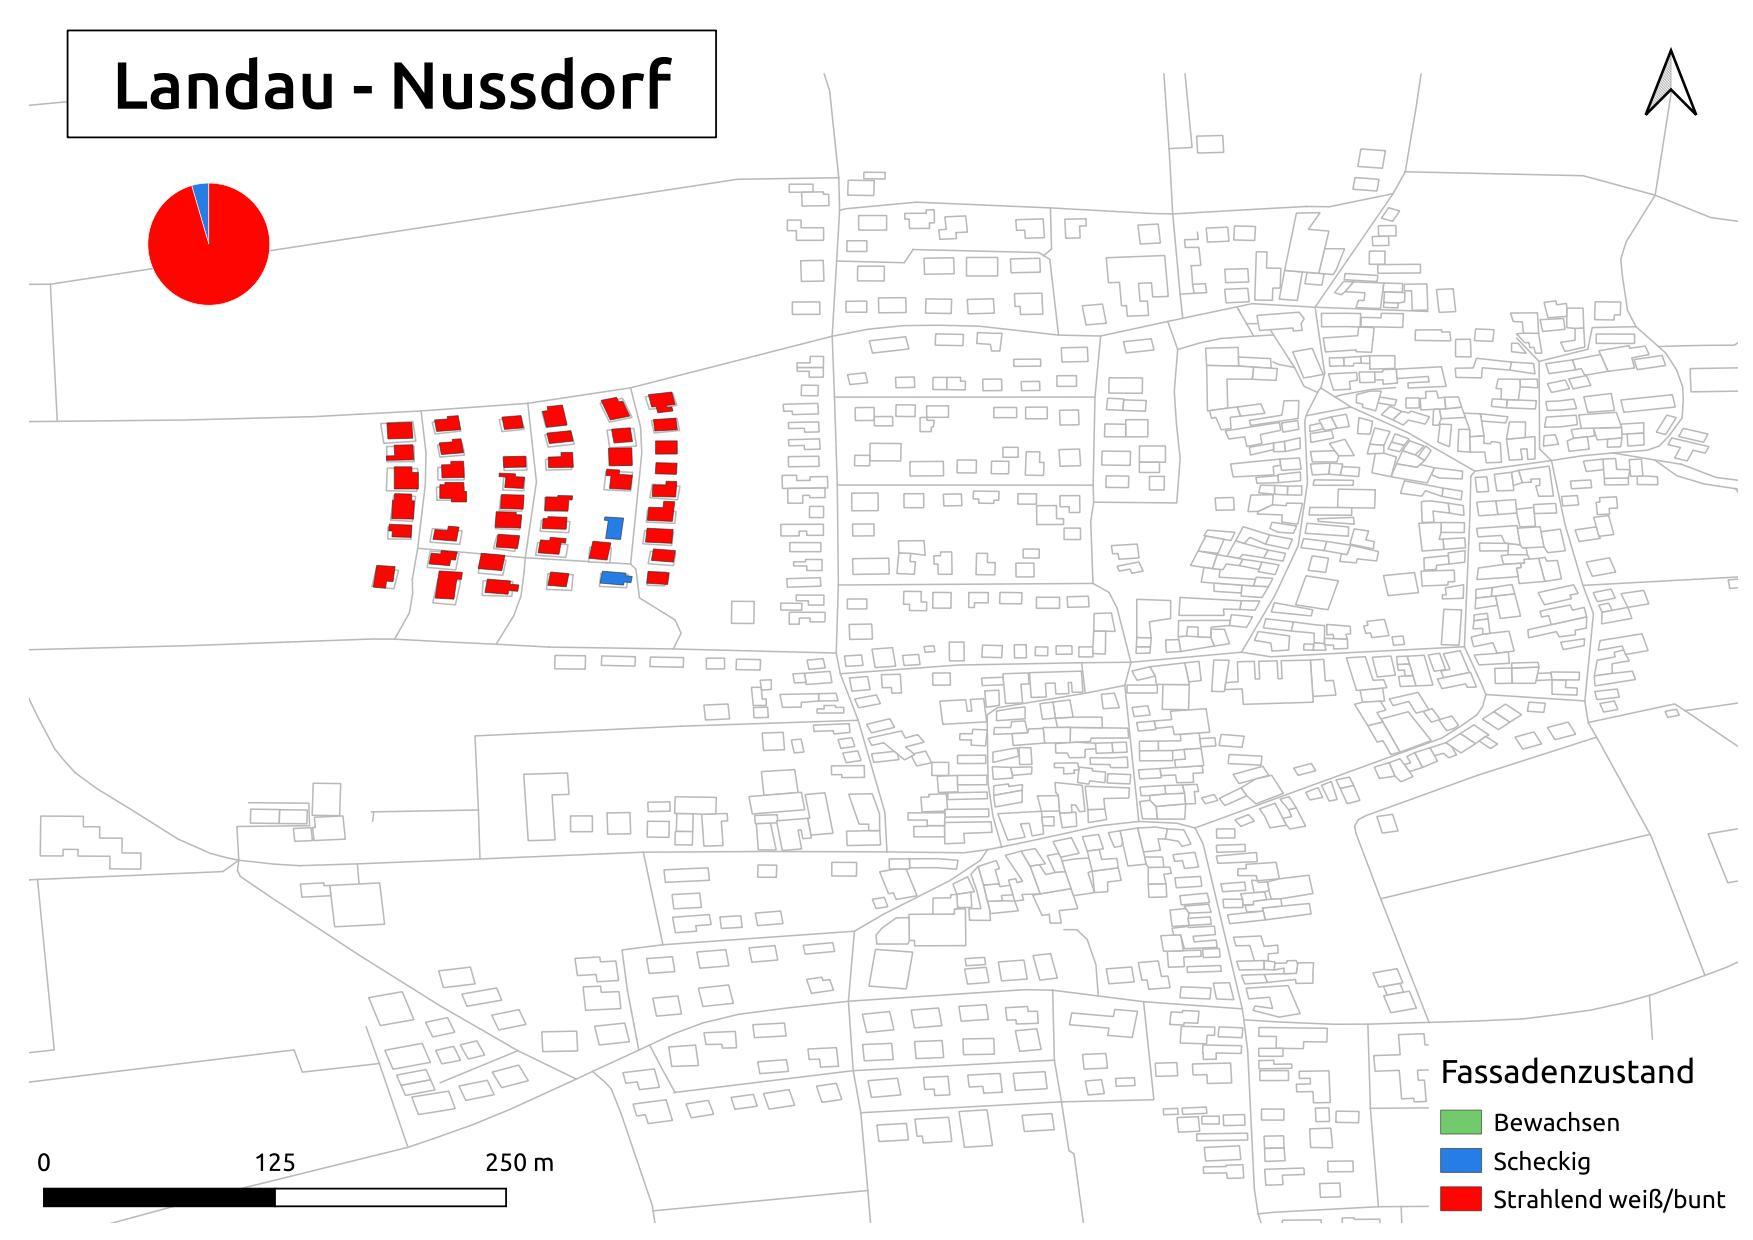 Biozidkarte Landau Nussdorf Fassadenzustand DE